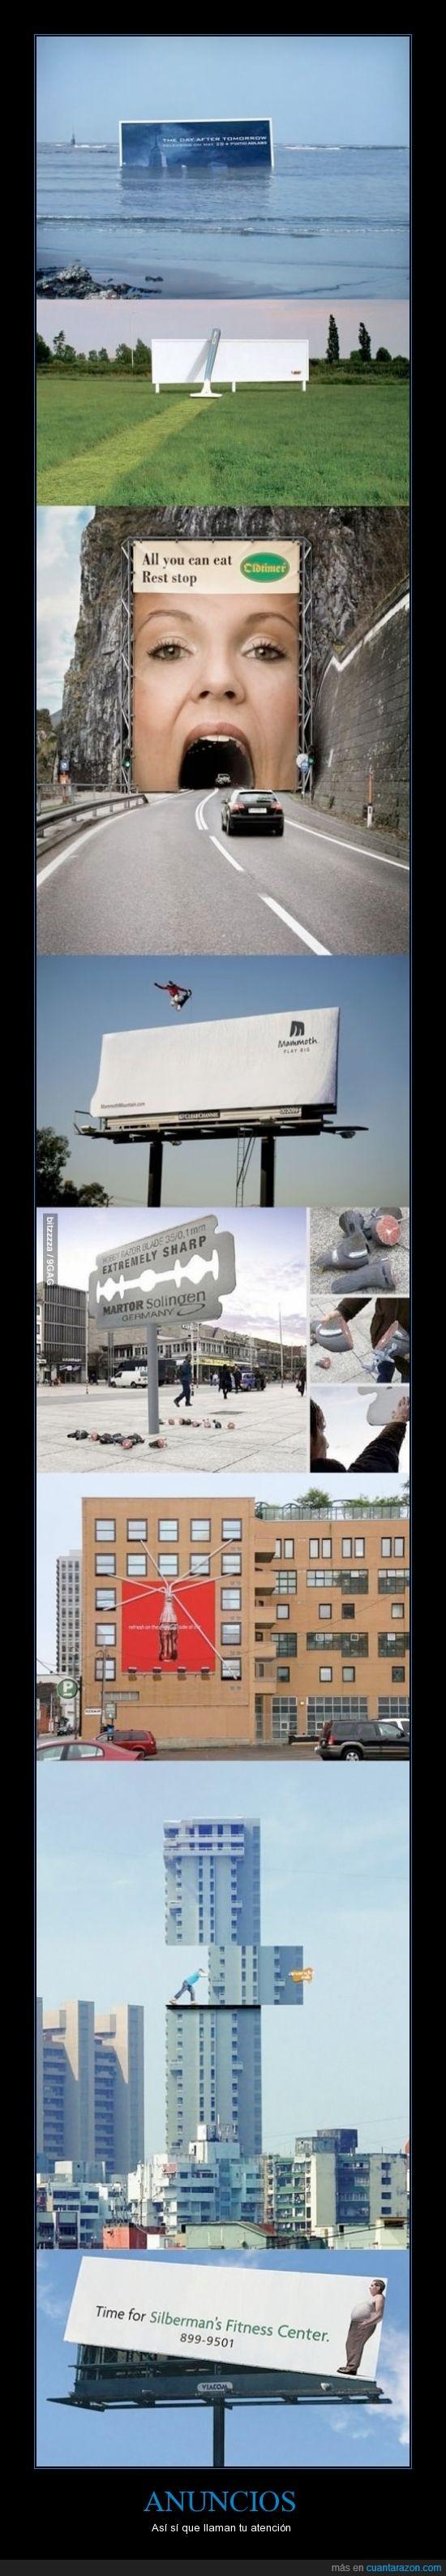 anuncio,cartel,creativo,cuchilla,gimnasio,marquesina